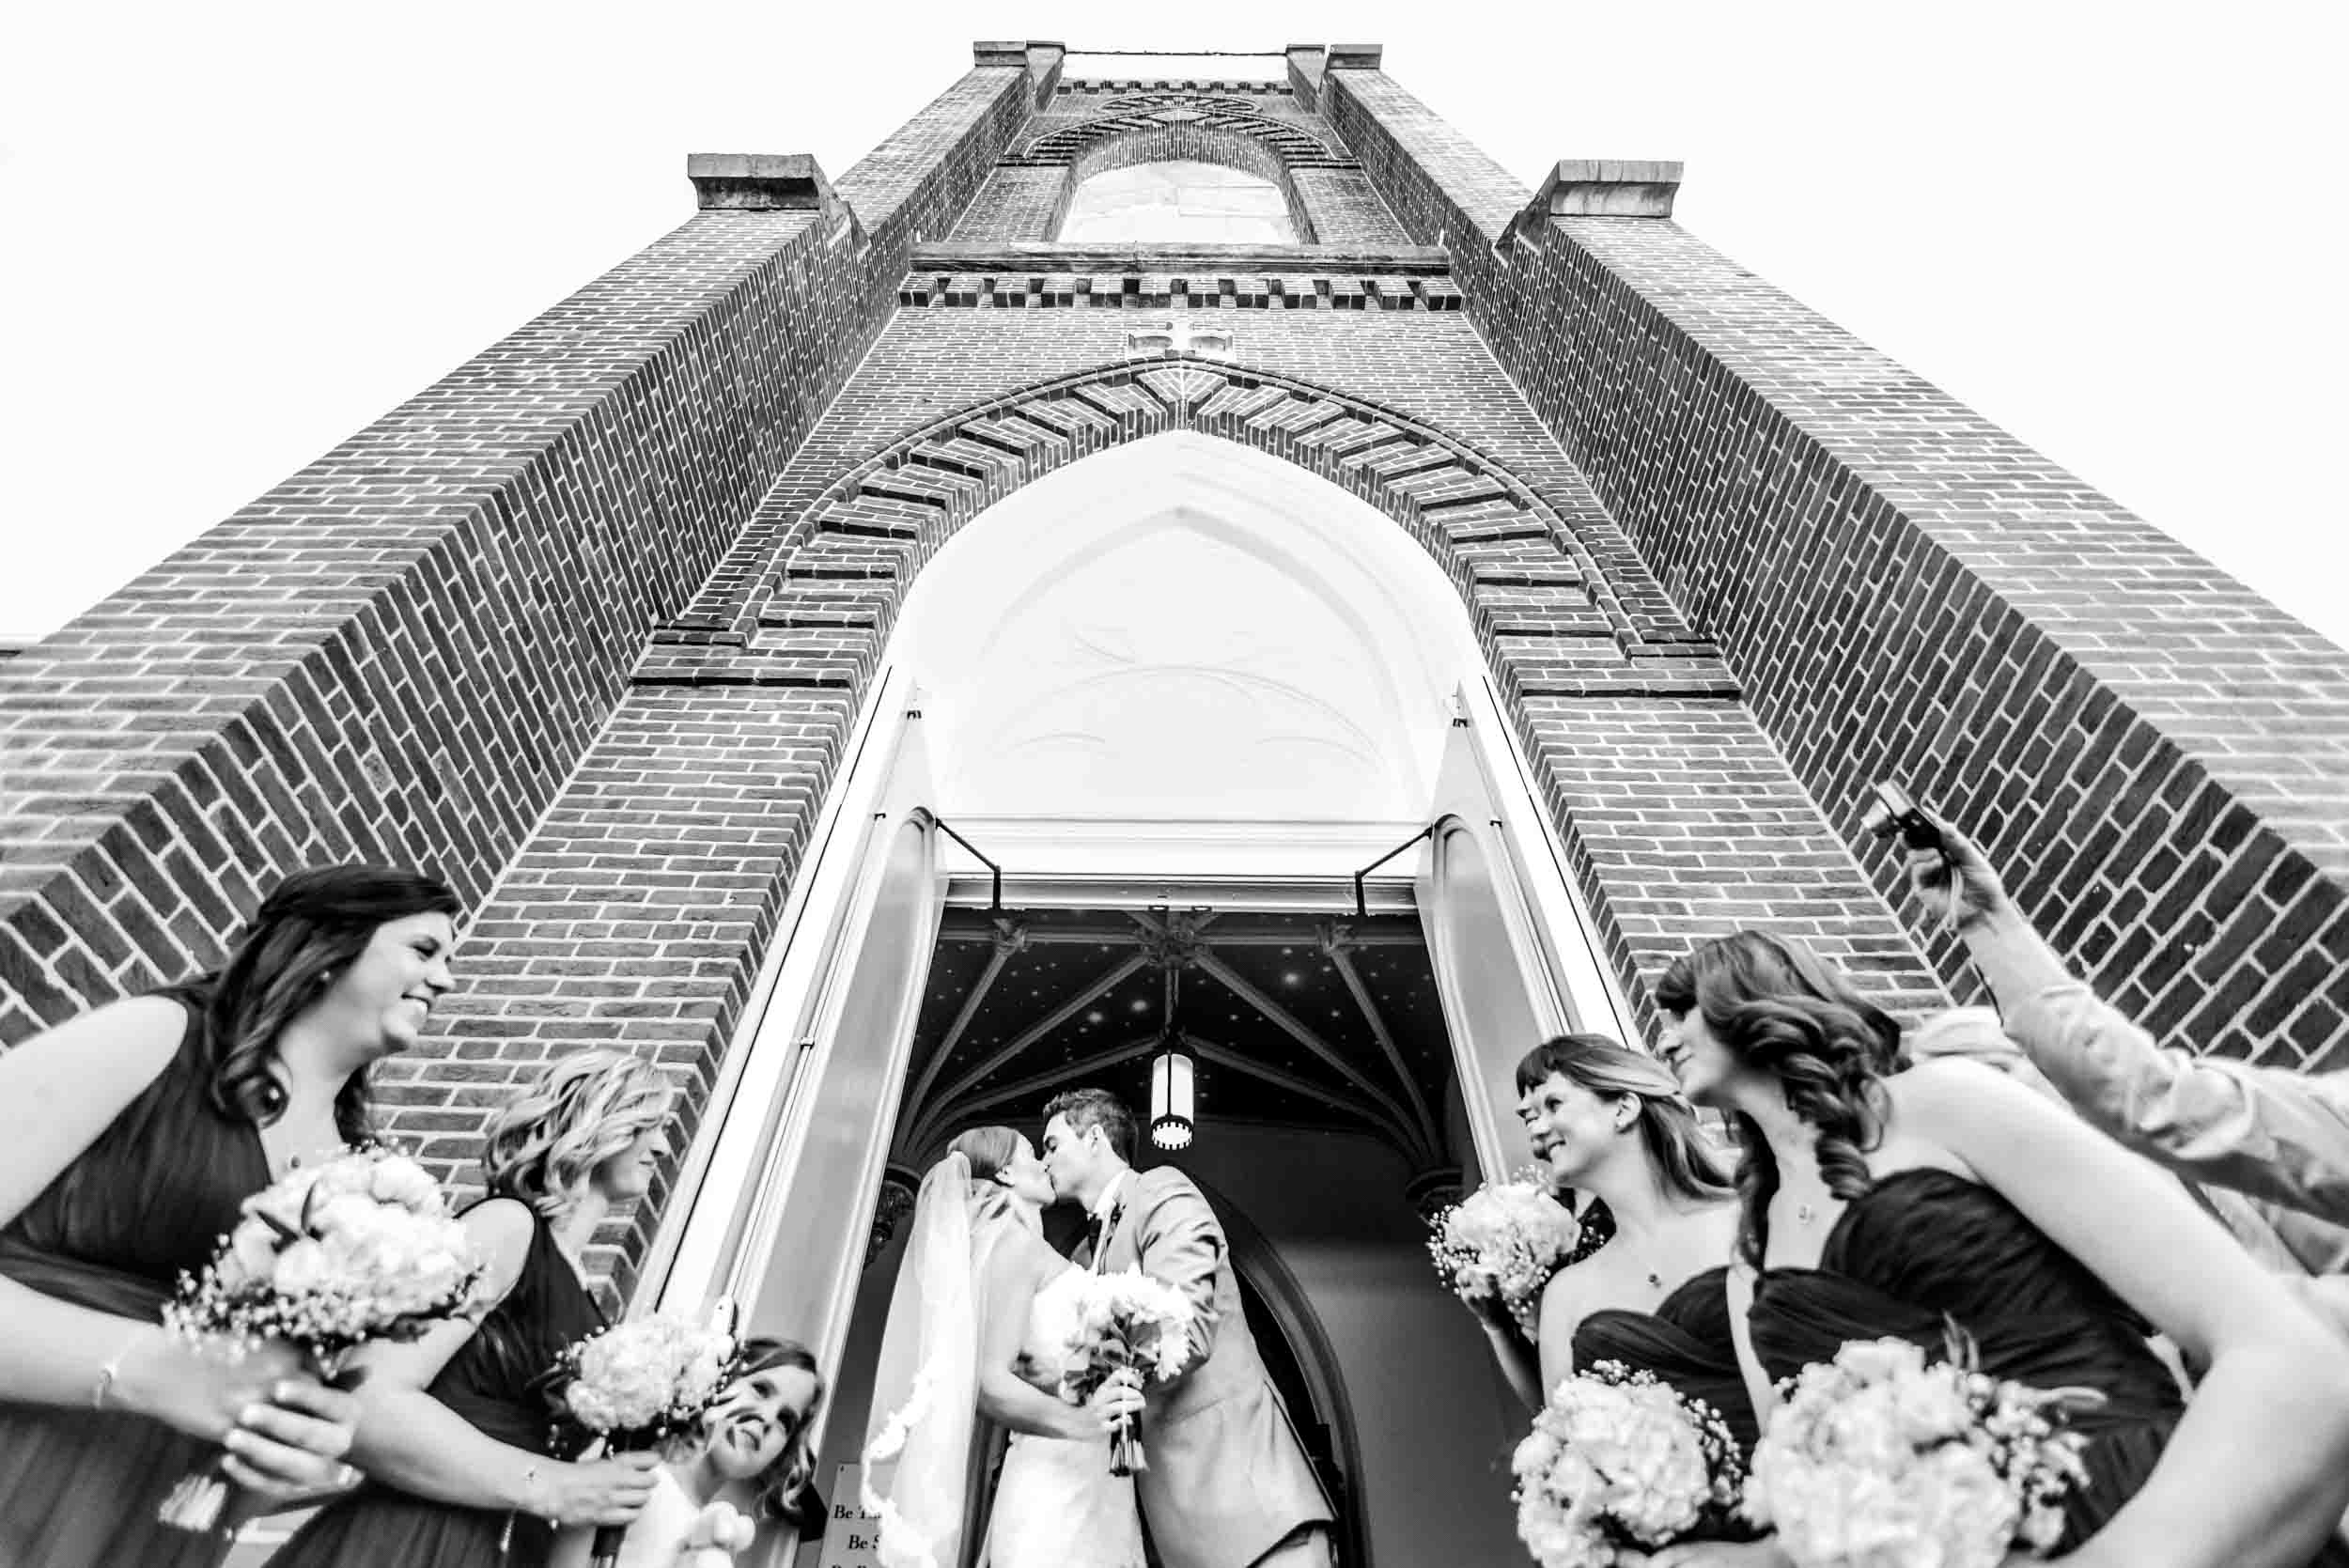 dc+metro+wedding+photographer+vadym+guliuk+photography+wedding+ceremony-2023.jpg